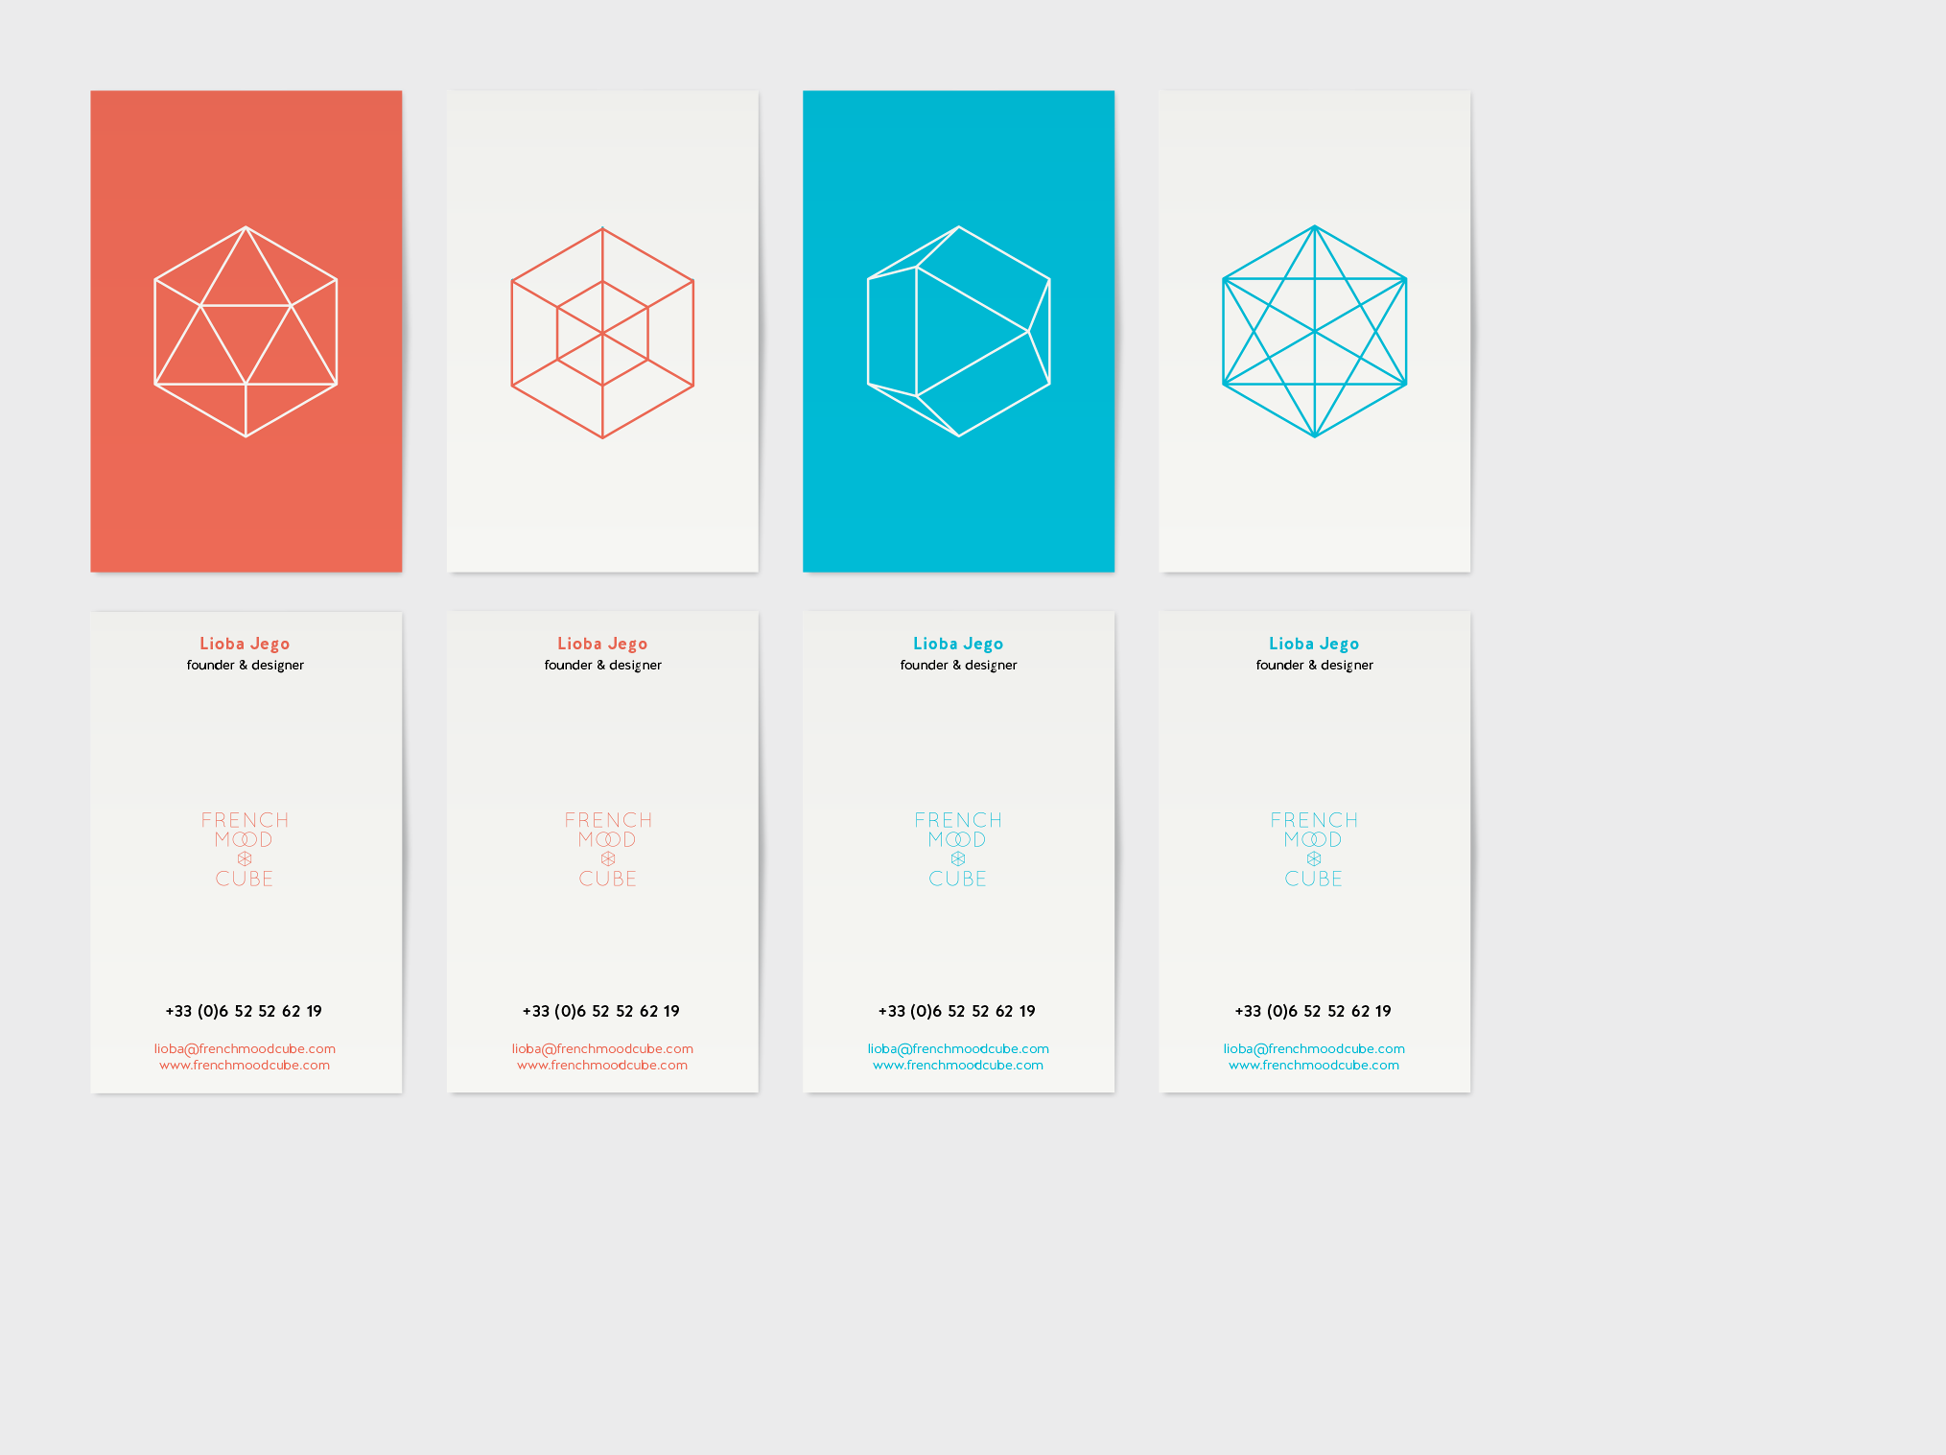 Atelier A Propos French Mood Cube Carte De Visite Corporate